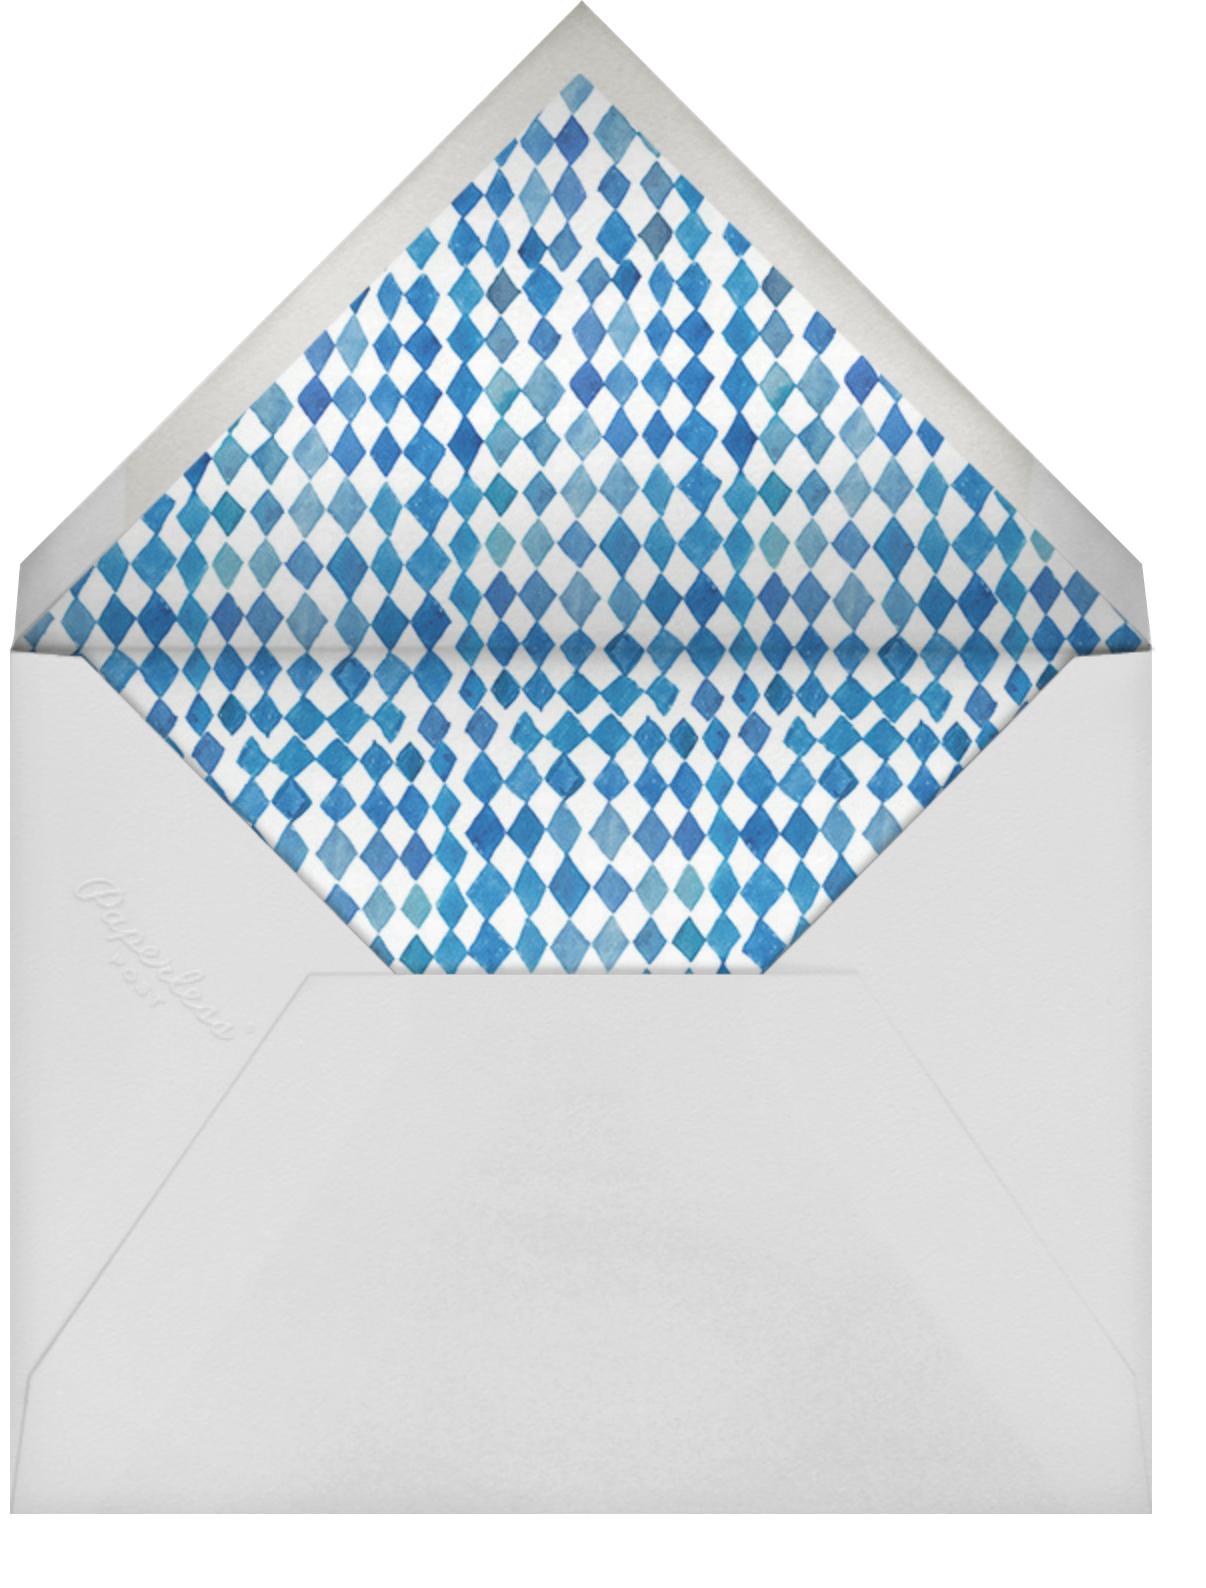 Brunch and Bubbles - Happy Menocal - Bridal shower - envelope back